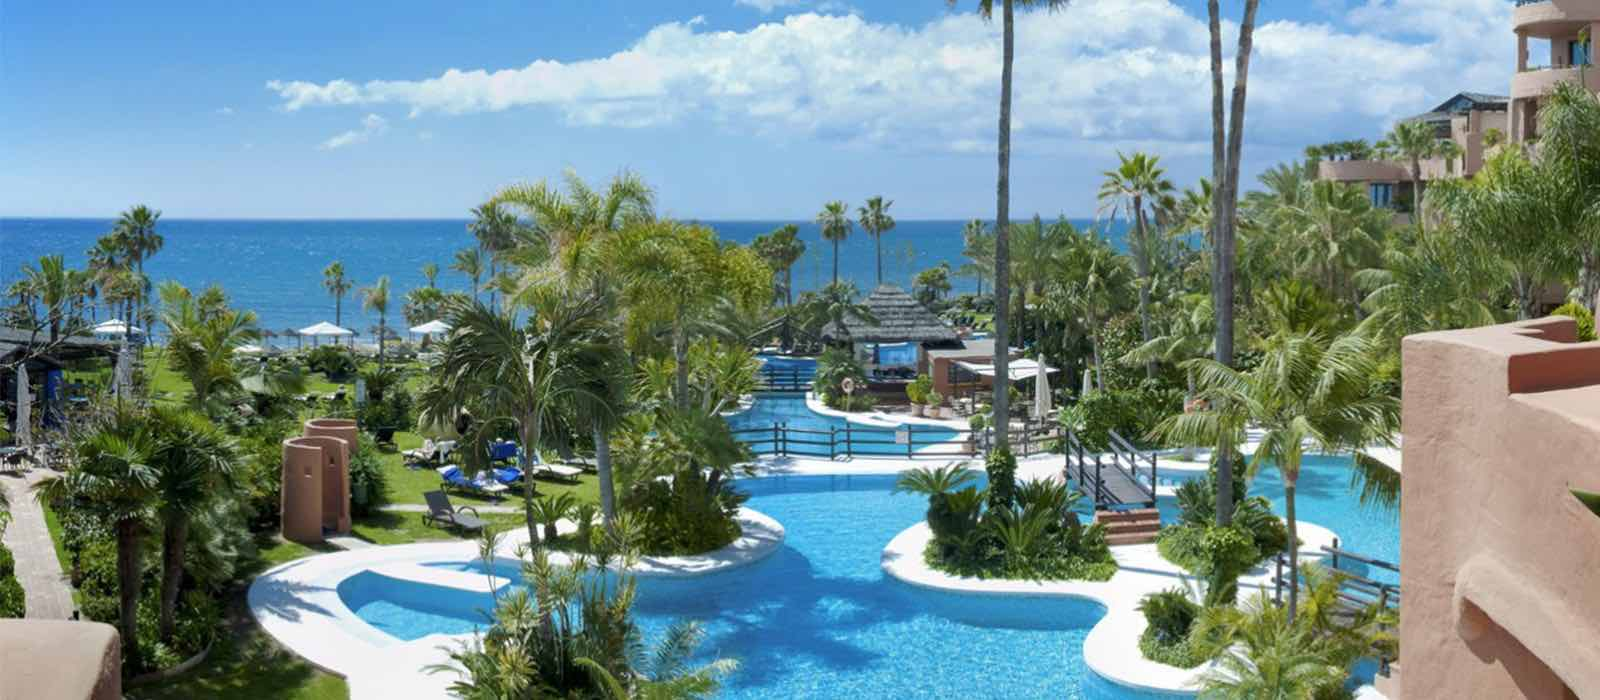 Marbella hotels top 20 from marbellafamilyfun com